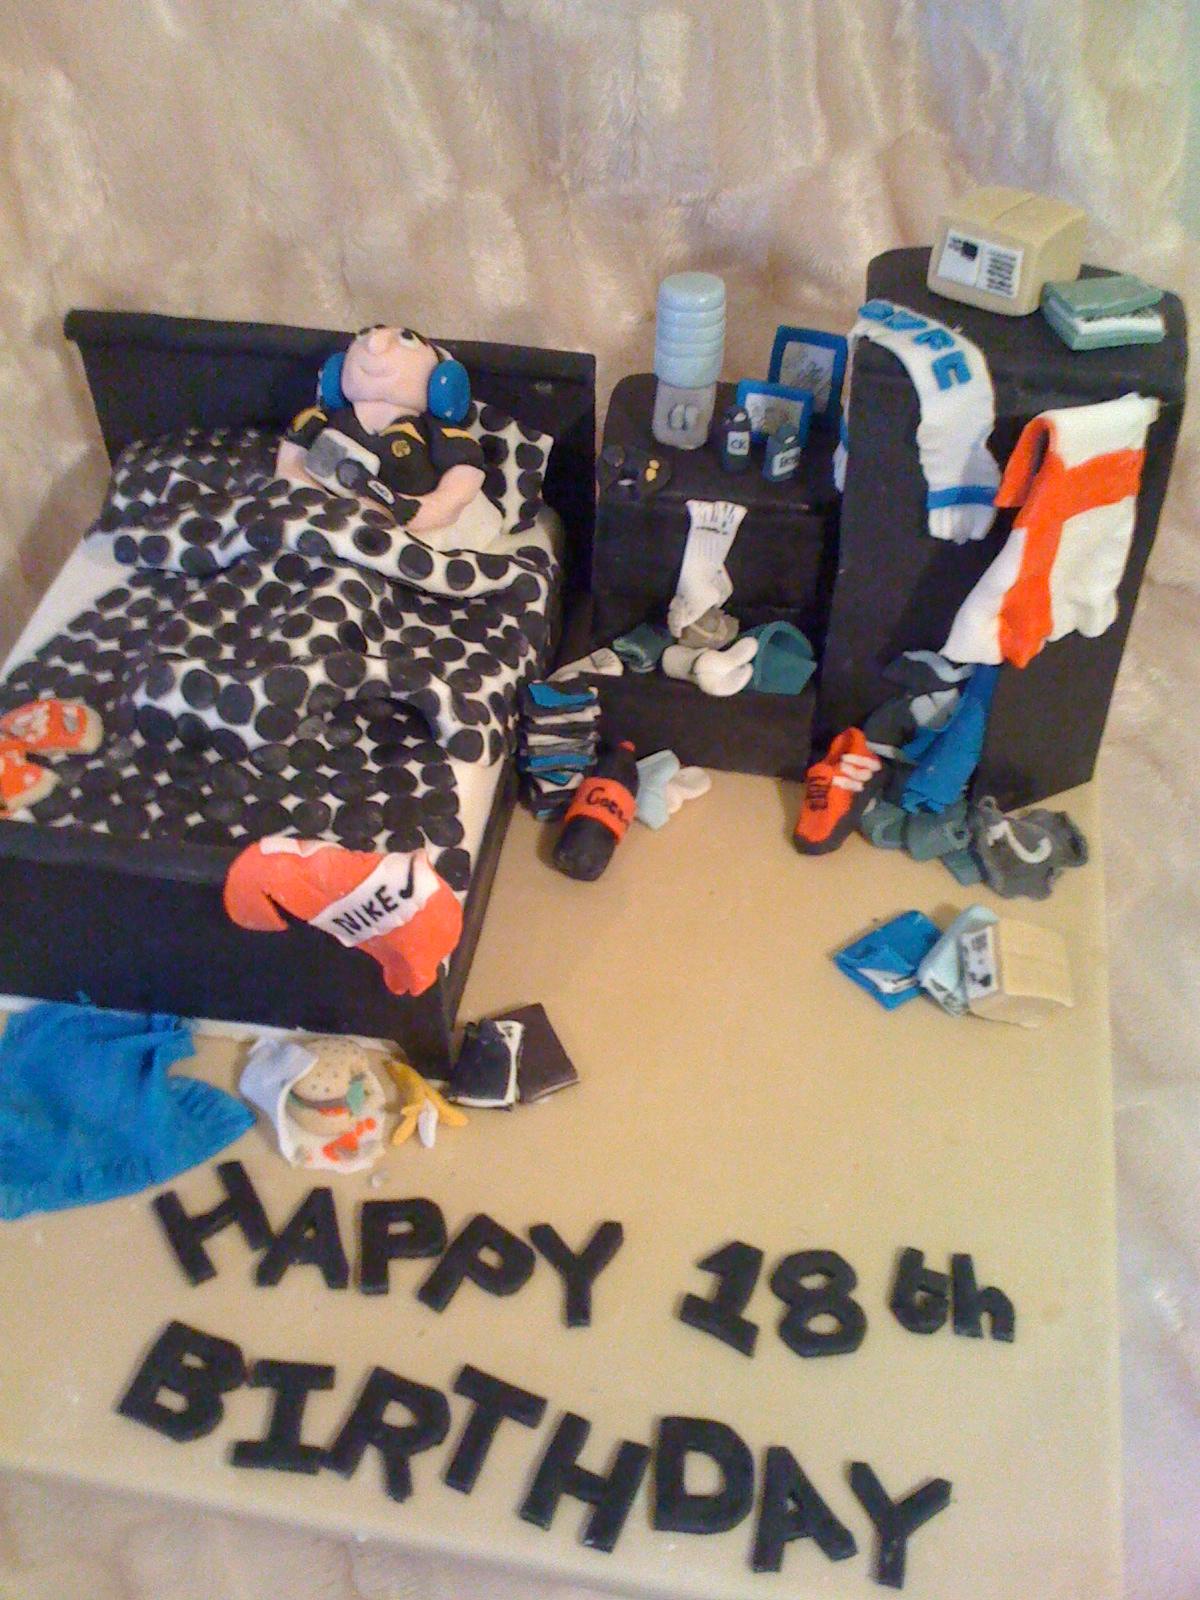 Messy Boys Bedroom Cake